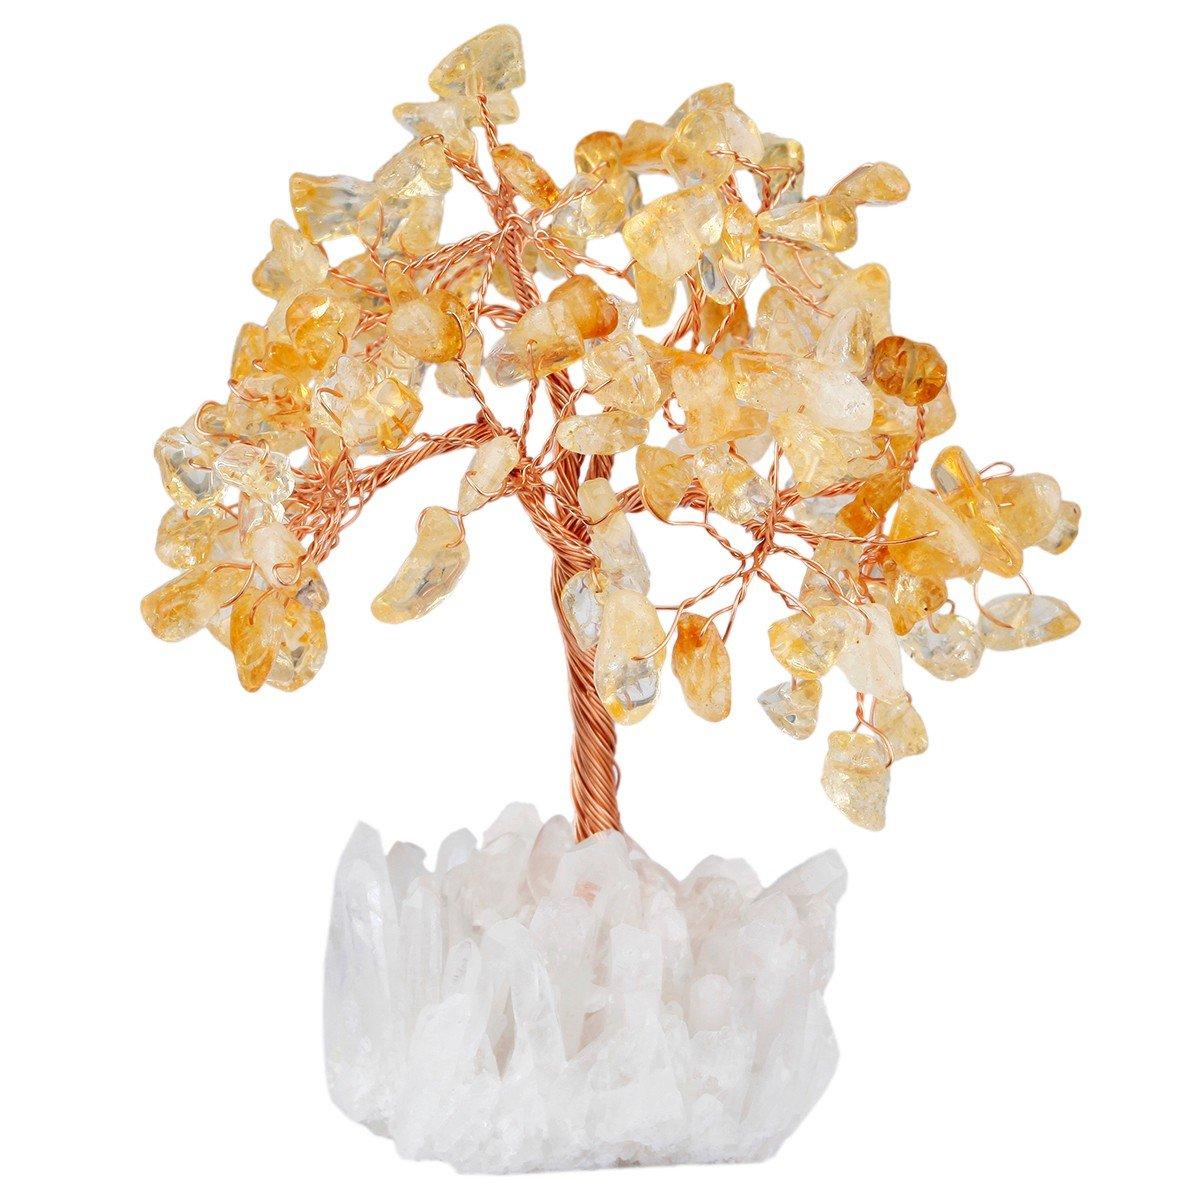 mookaitedecor Citrine Crystal Tree, Quartz Cluster Rock Crystal Base Bonsai Money Tree for Wealth and Luck